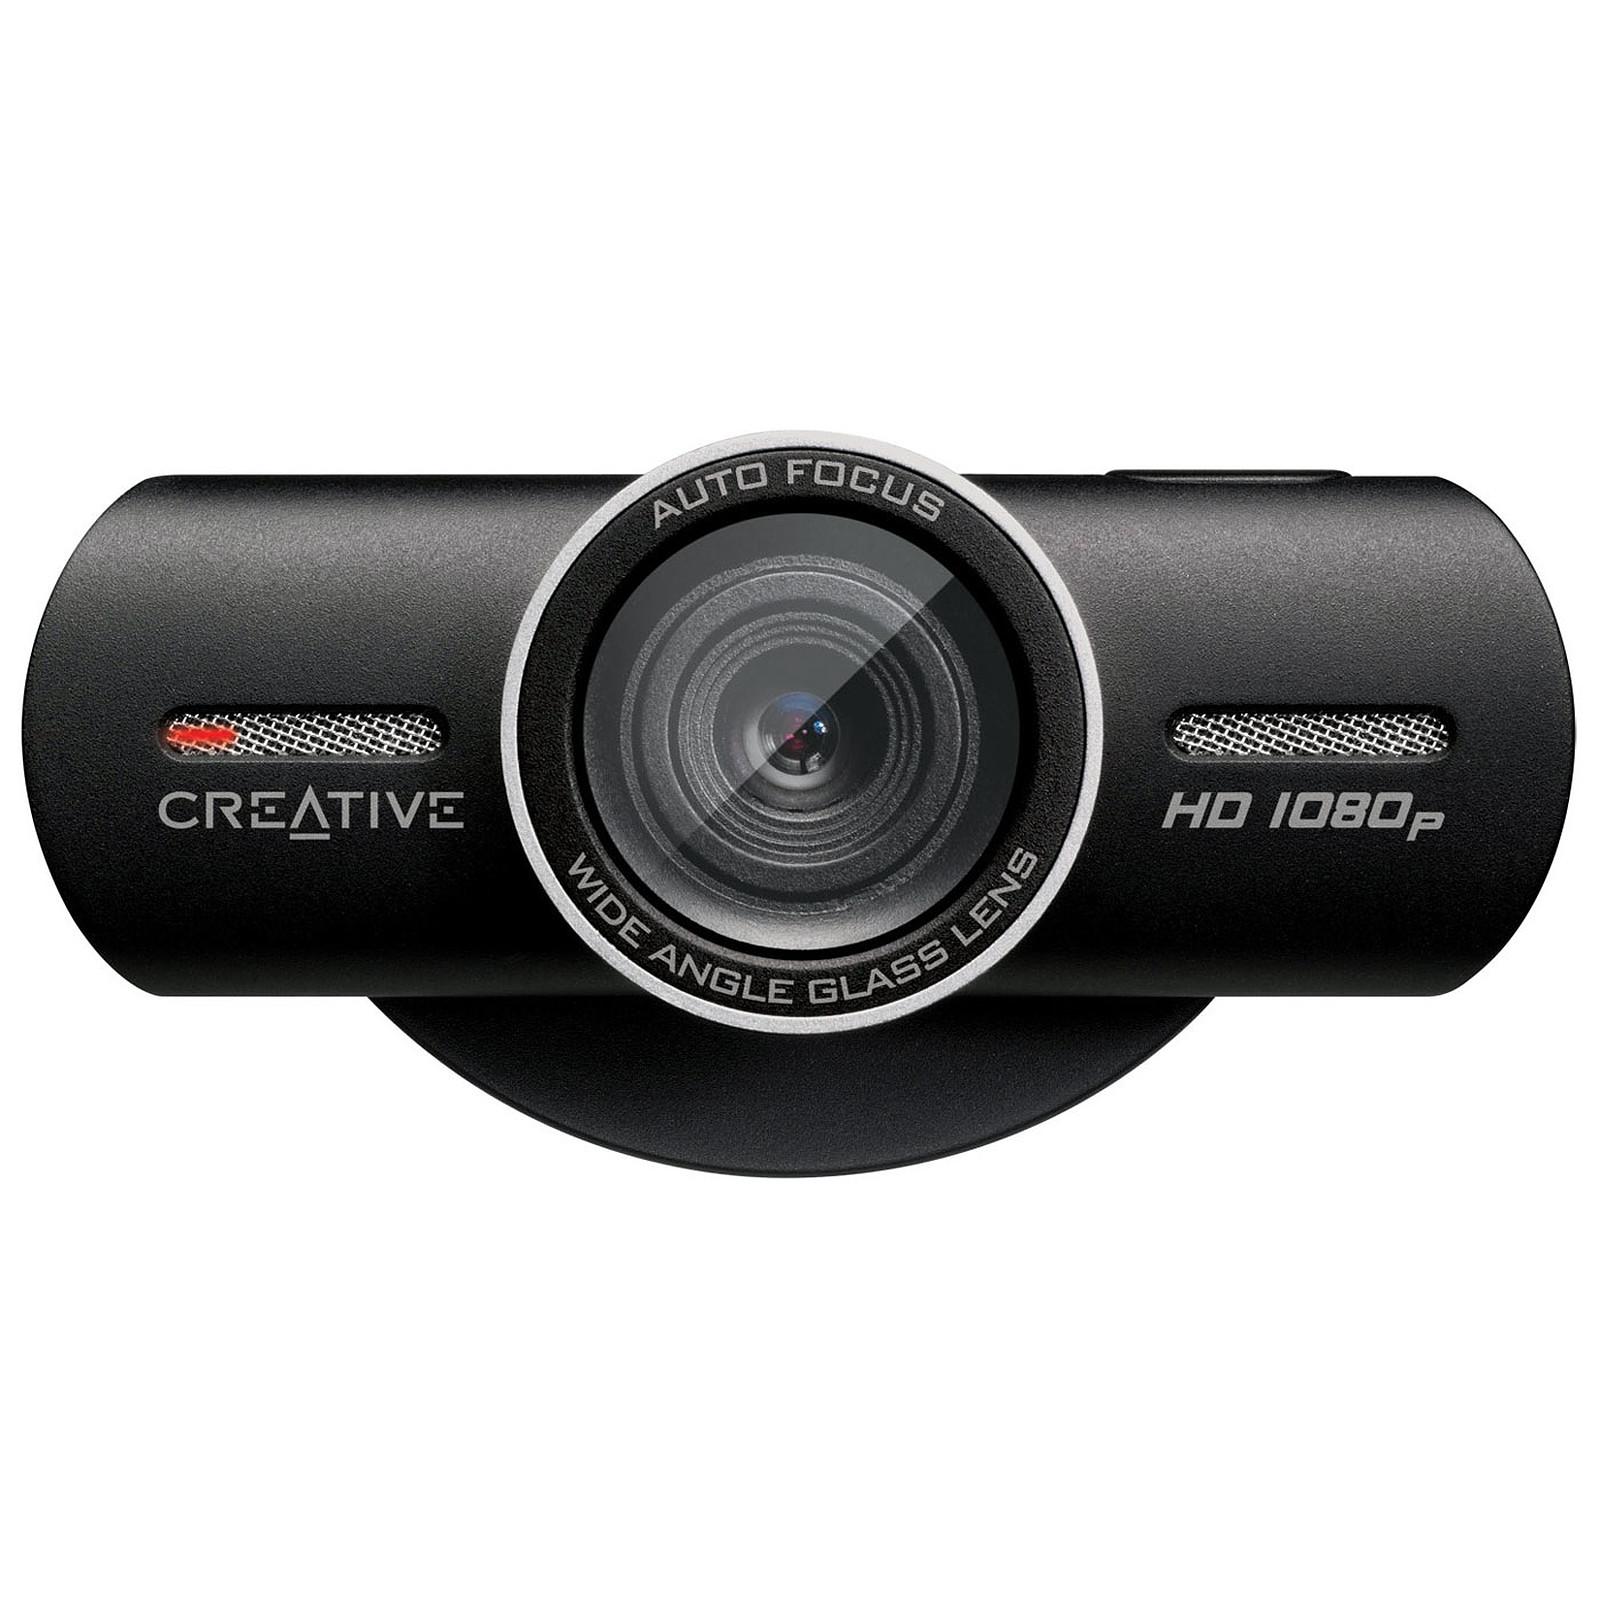 Creative Live! Cam Socialize HD 1080